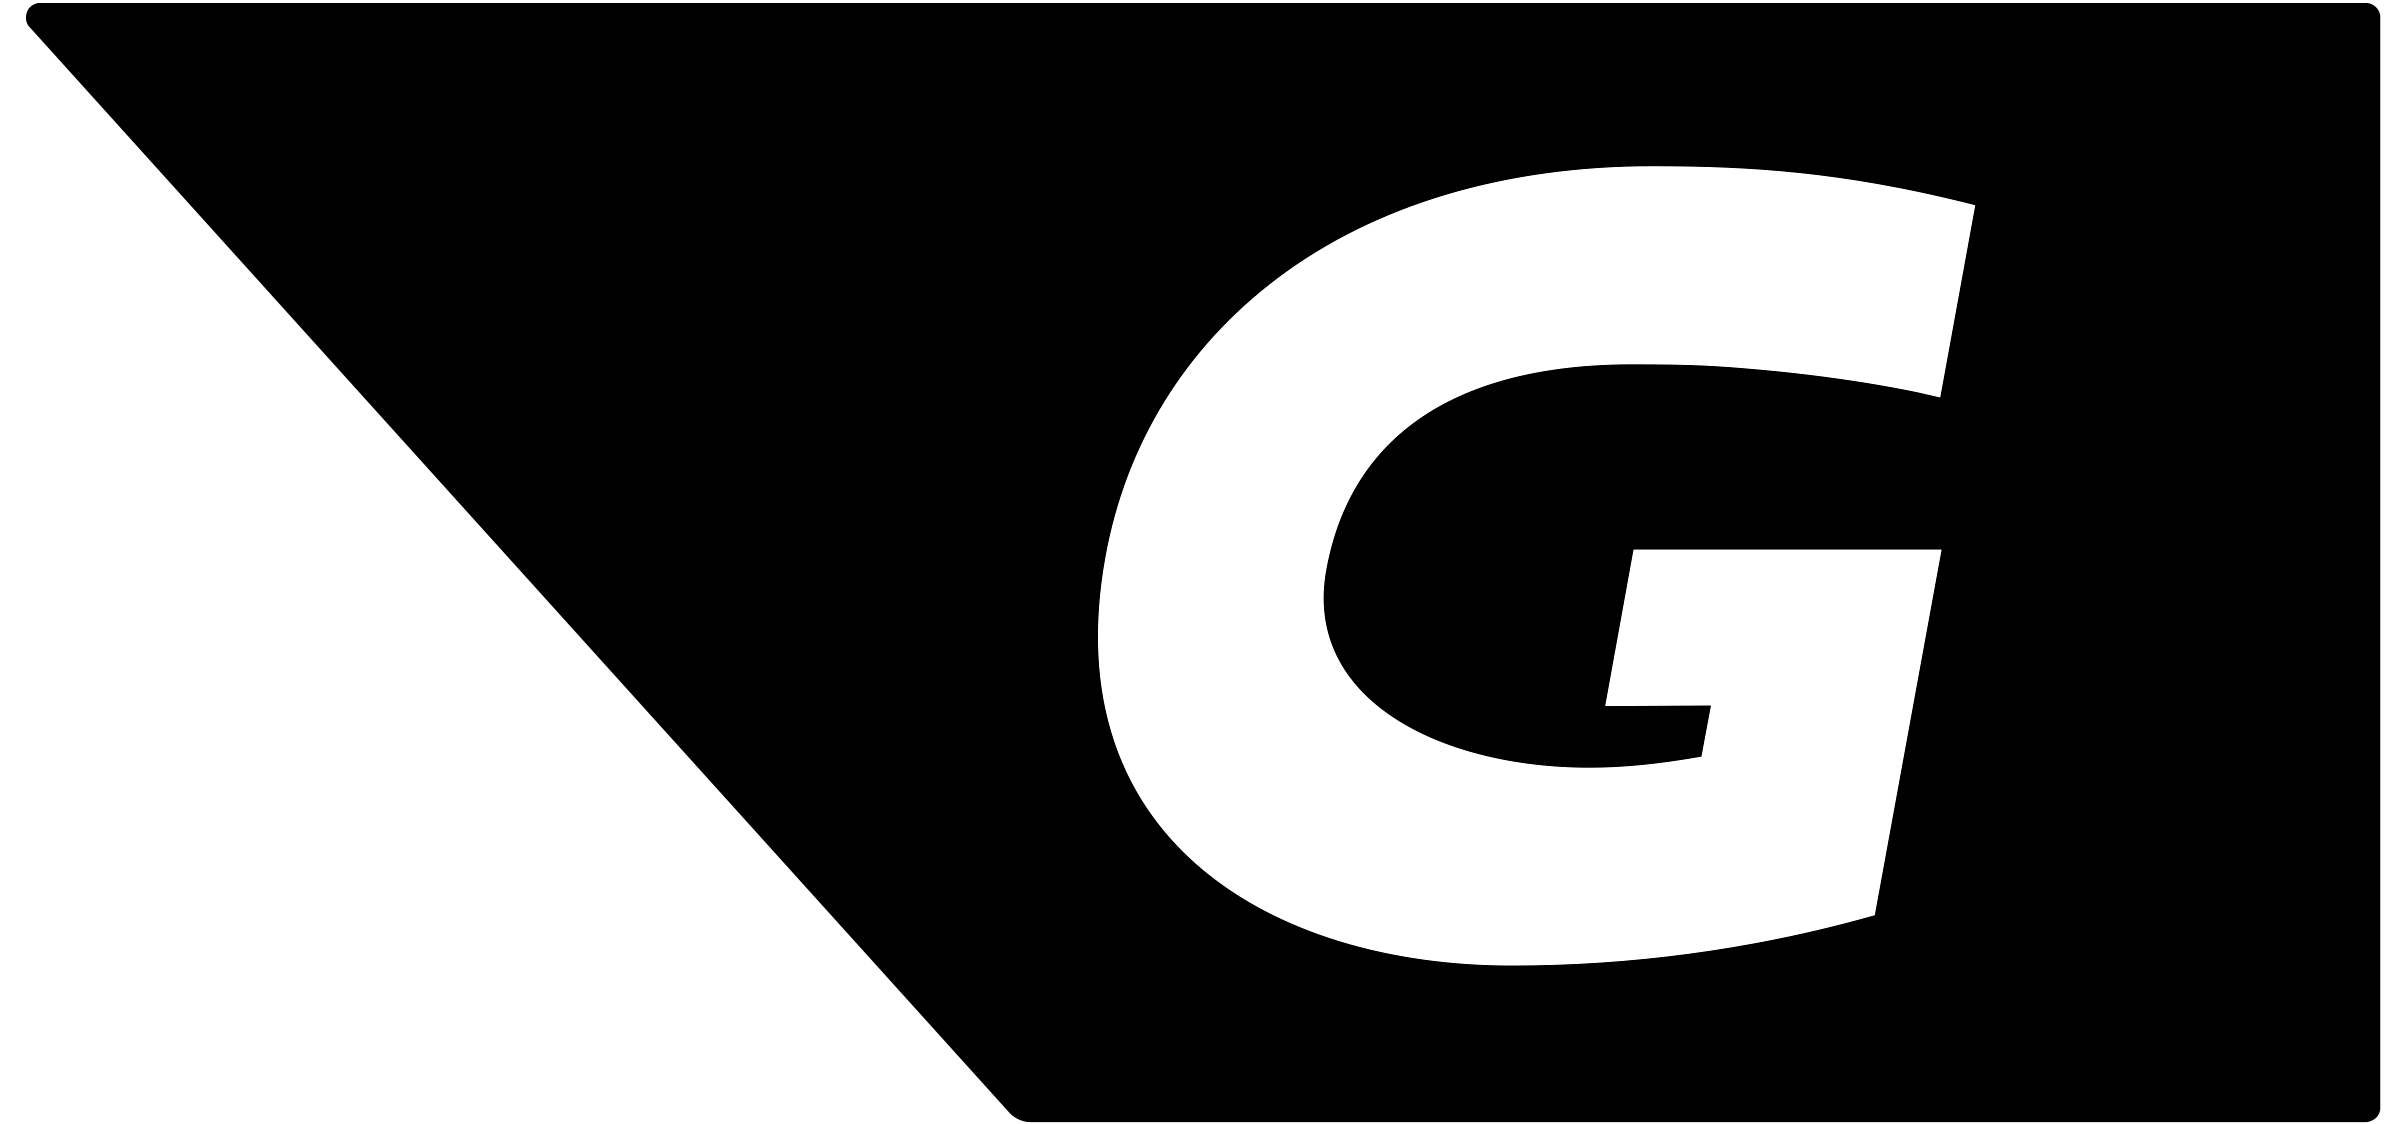 John Deere G-Series Performance Tier logo